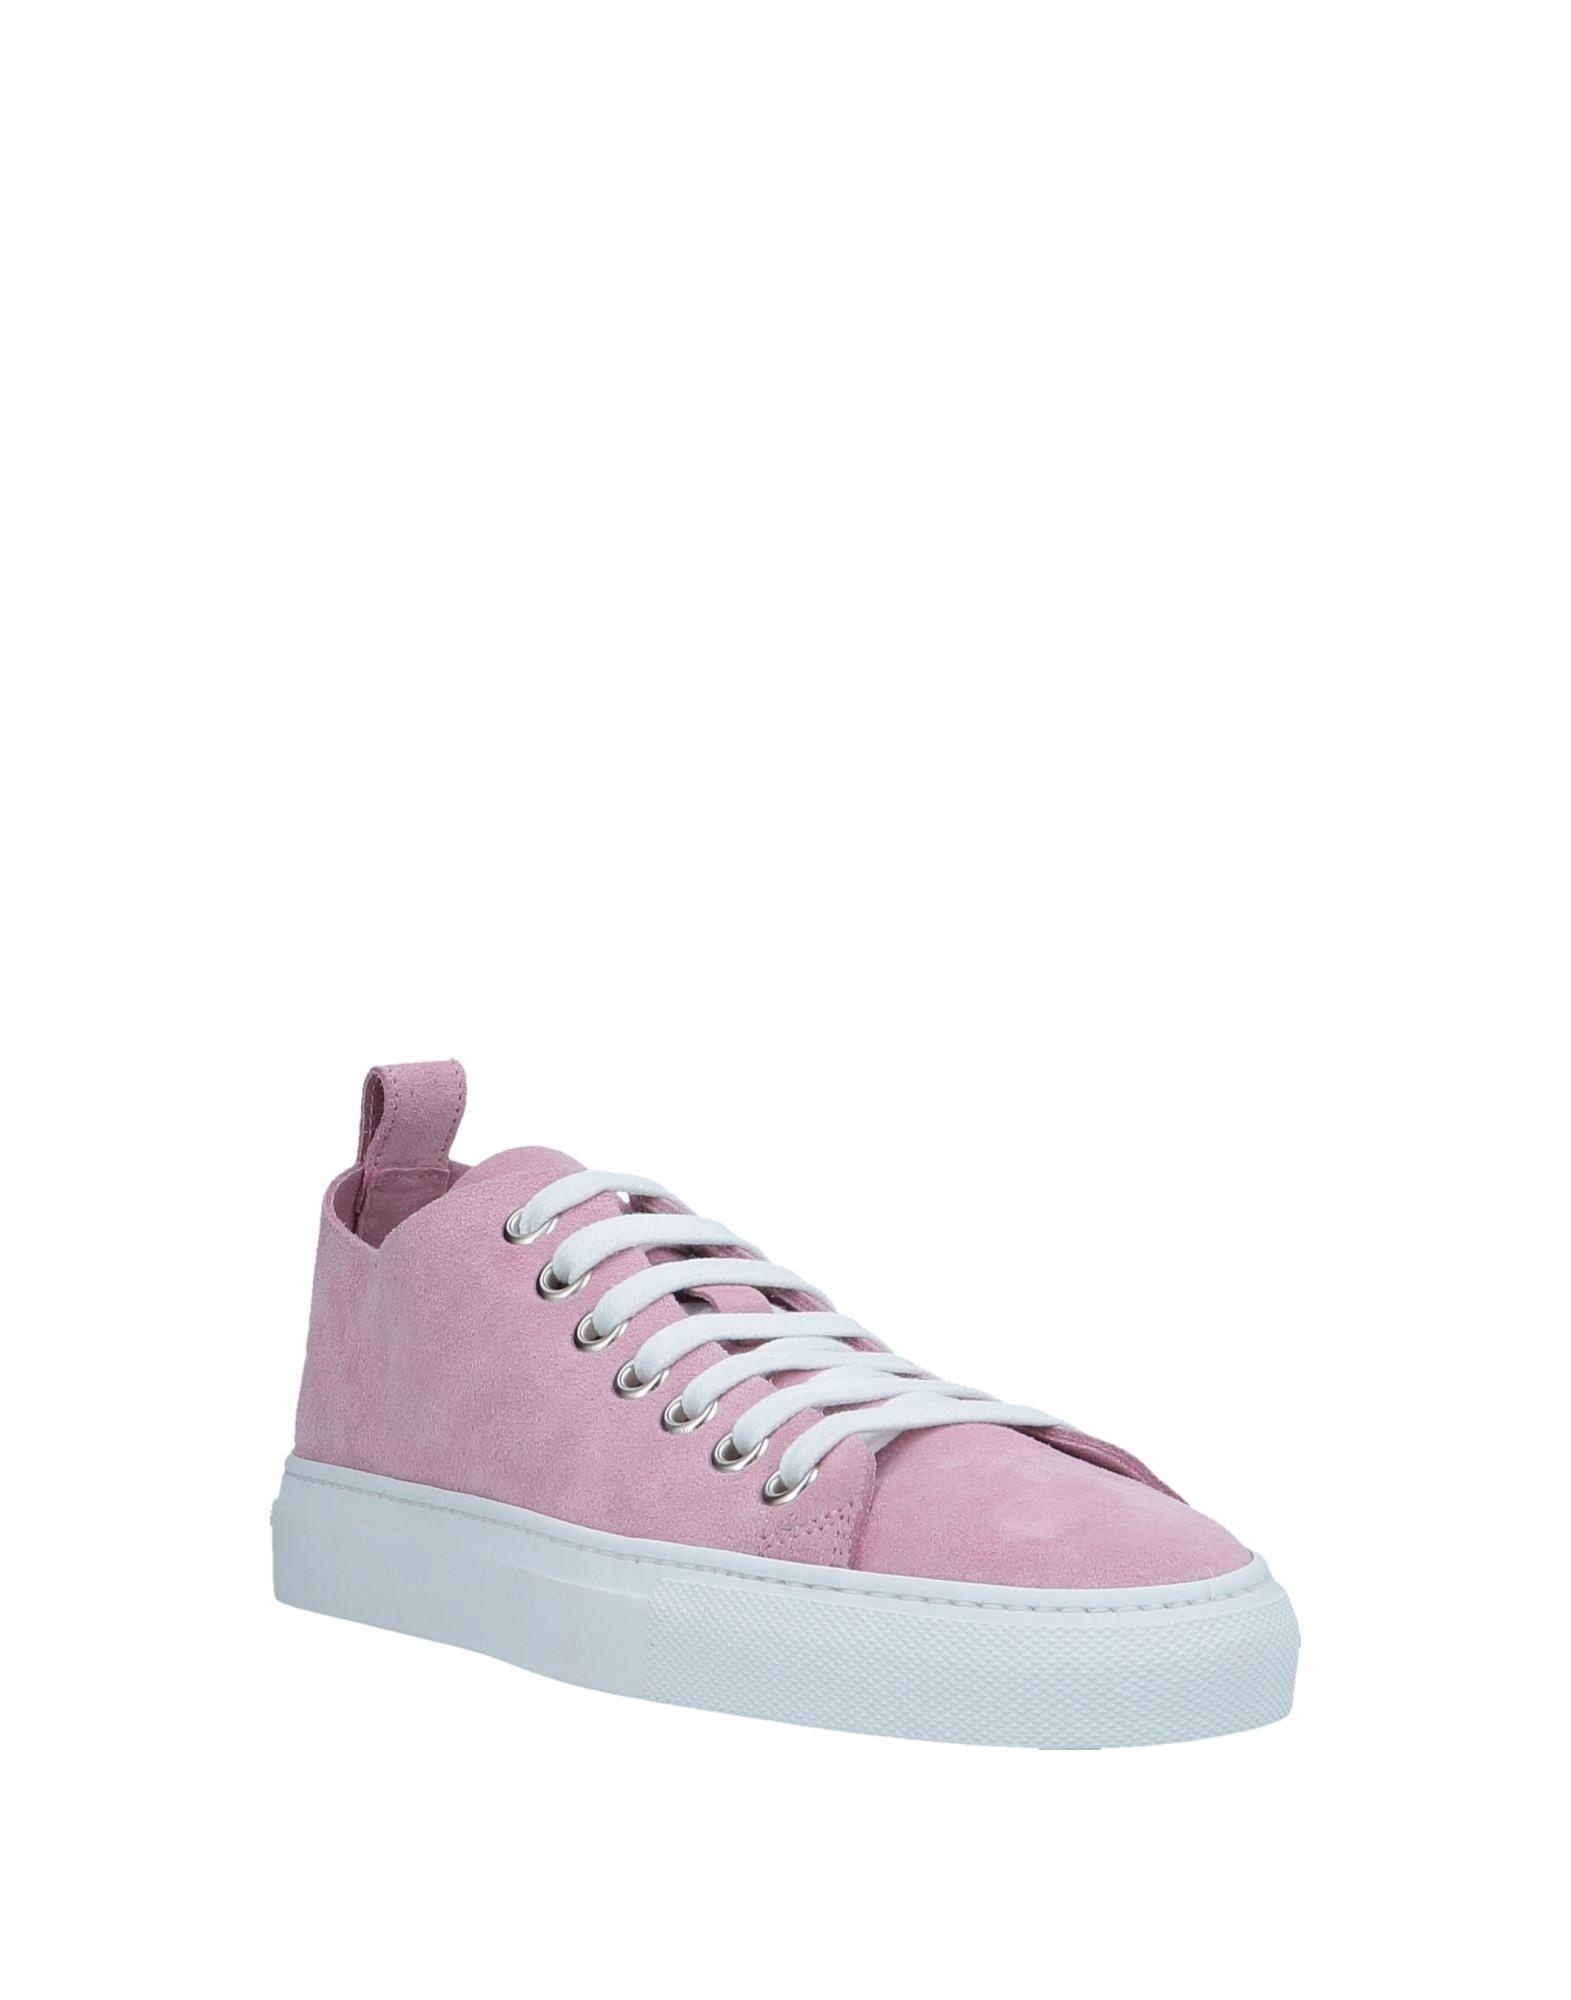 Dsquared2 Sneakers strapazierfähige Damen  11560270PRGut aussehende strapazierfähige Sneakers Schuhe 0ce3f5